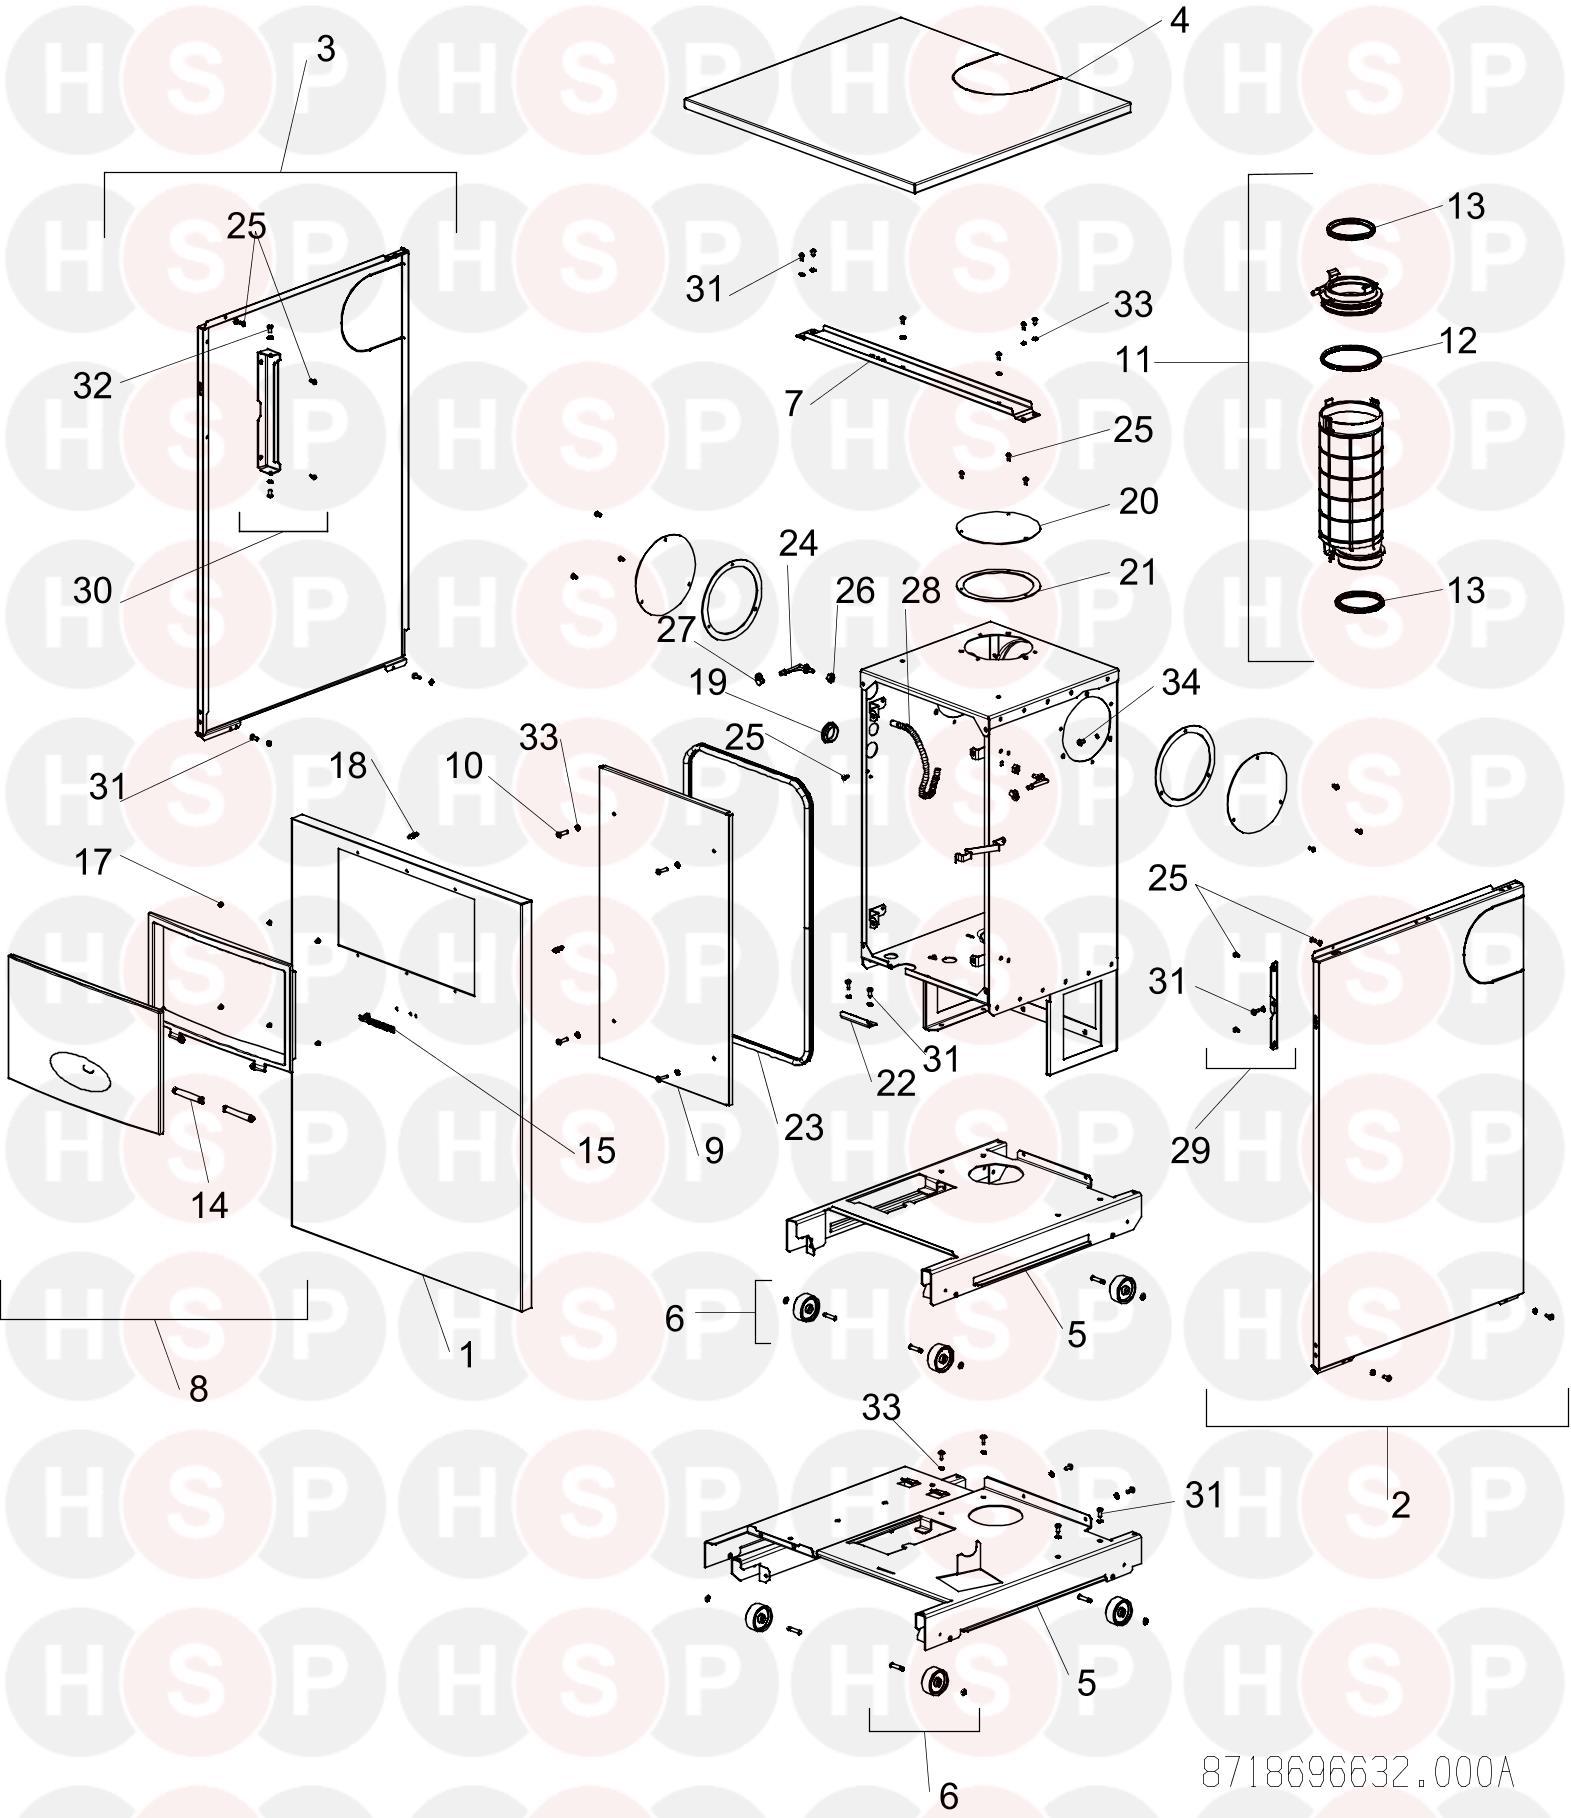 Worcester GREENSTAR FS 30CDI REGULAR ErP (CASING) Diagram